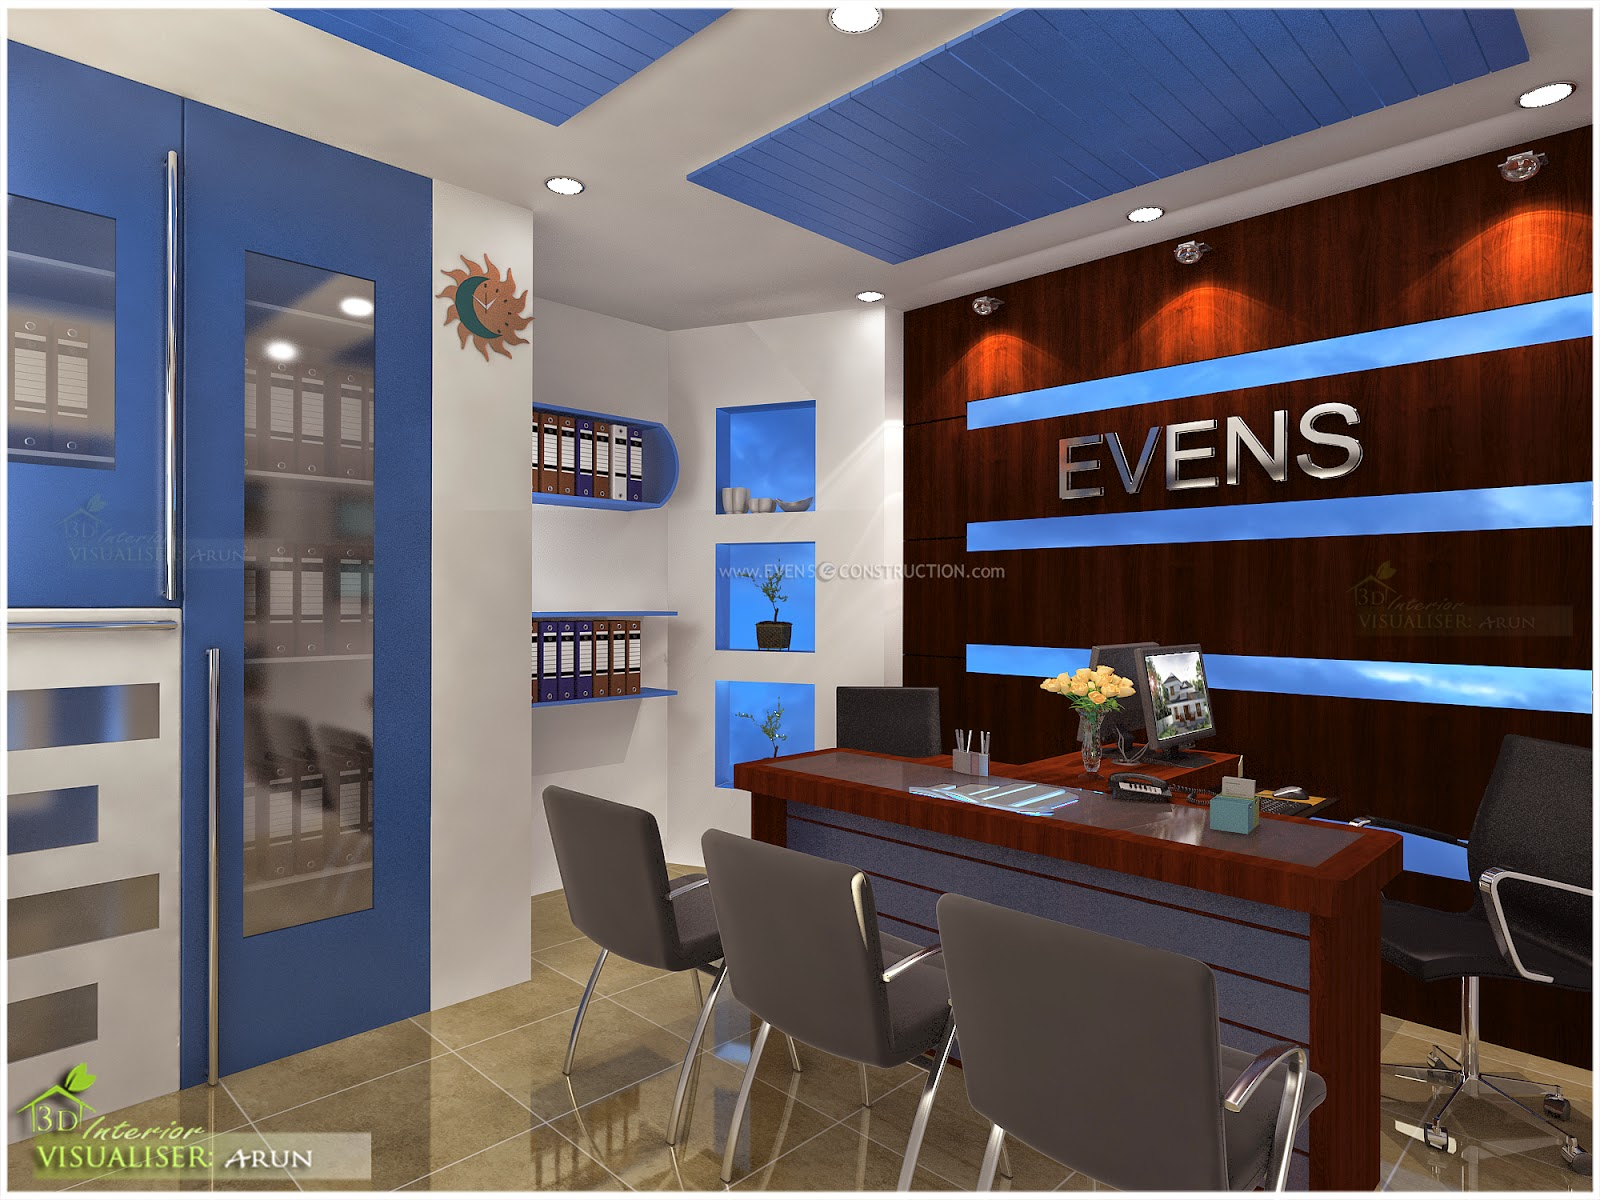 Evens construction pvt ltd beautiful office designs for Beautiful office design